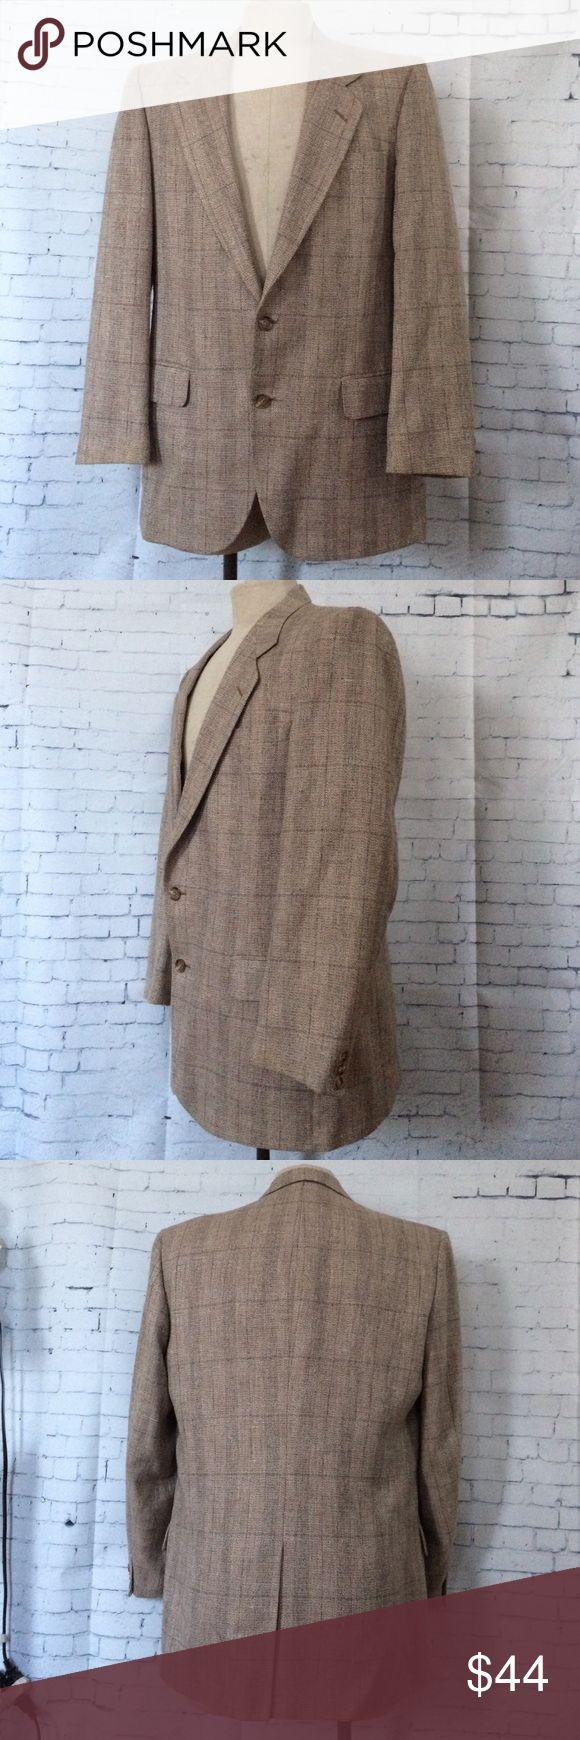 "Nino Cerruti Mens Beige Silk Sport Coat Jacket 44R Nino Cerruti Mens Beige Silk Sport Coat Jacket 44R.   Measurements Shoulders 18.5"", Chest 46"", length 31.5"", Sleeve 25.5"" and Inseam 17"". Nino Cerruti Suits & Blazers Sport Coats & Blazers"